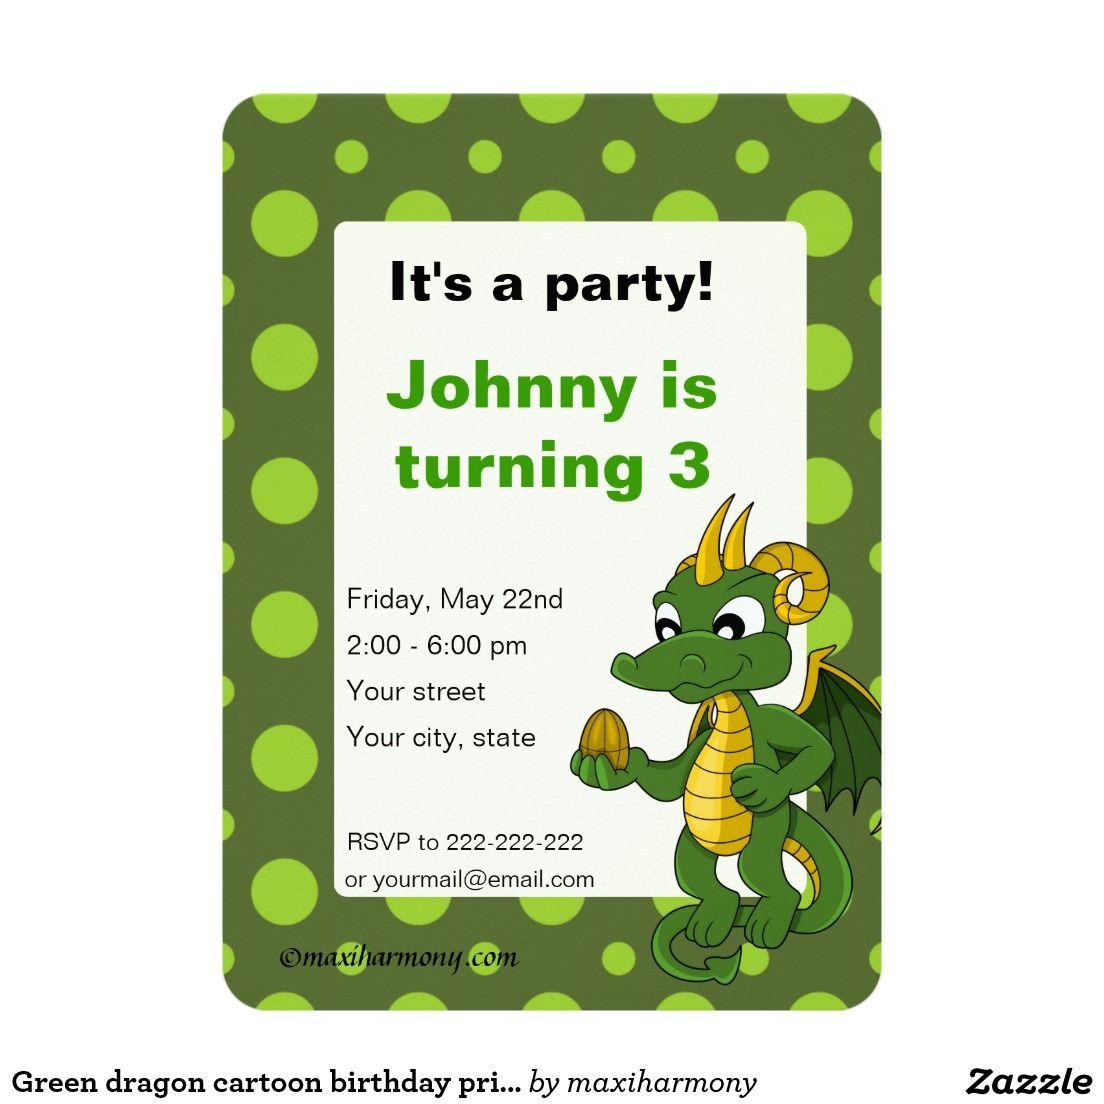 Green dragon cartoon birthday print invitations   Green dragon